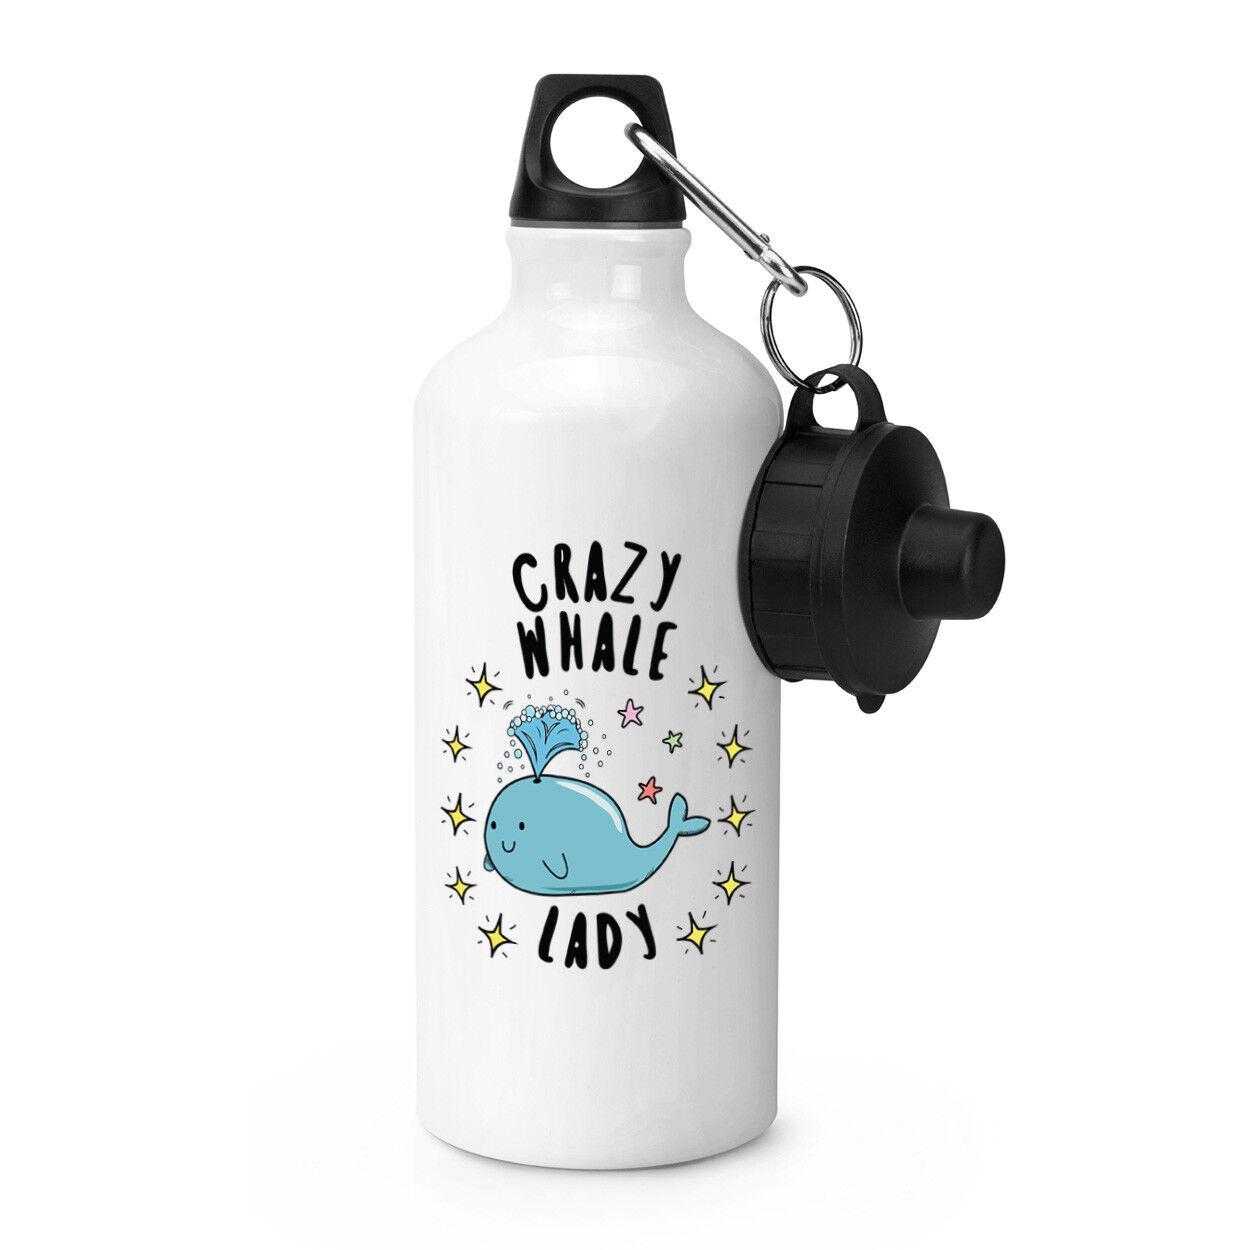 Crazy baleine LADY STARS Sports Boisson Bouteille Bouteille Bouteille Camping fiole-Drôle Animal 9c6740